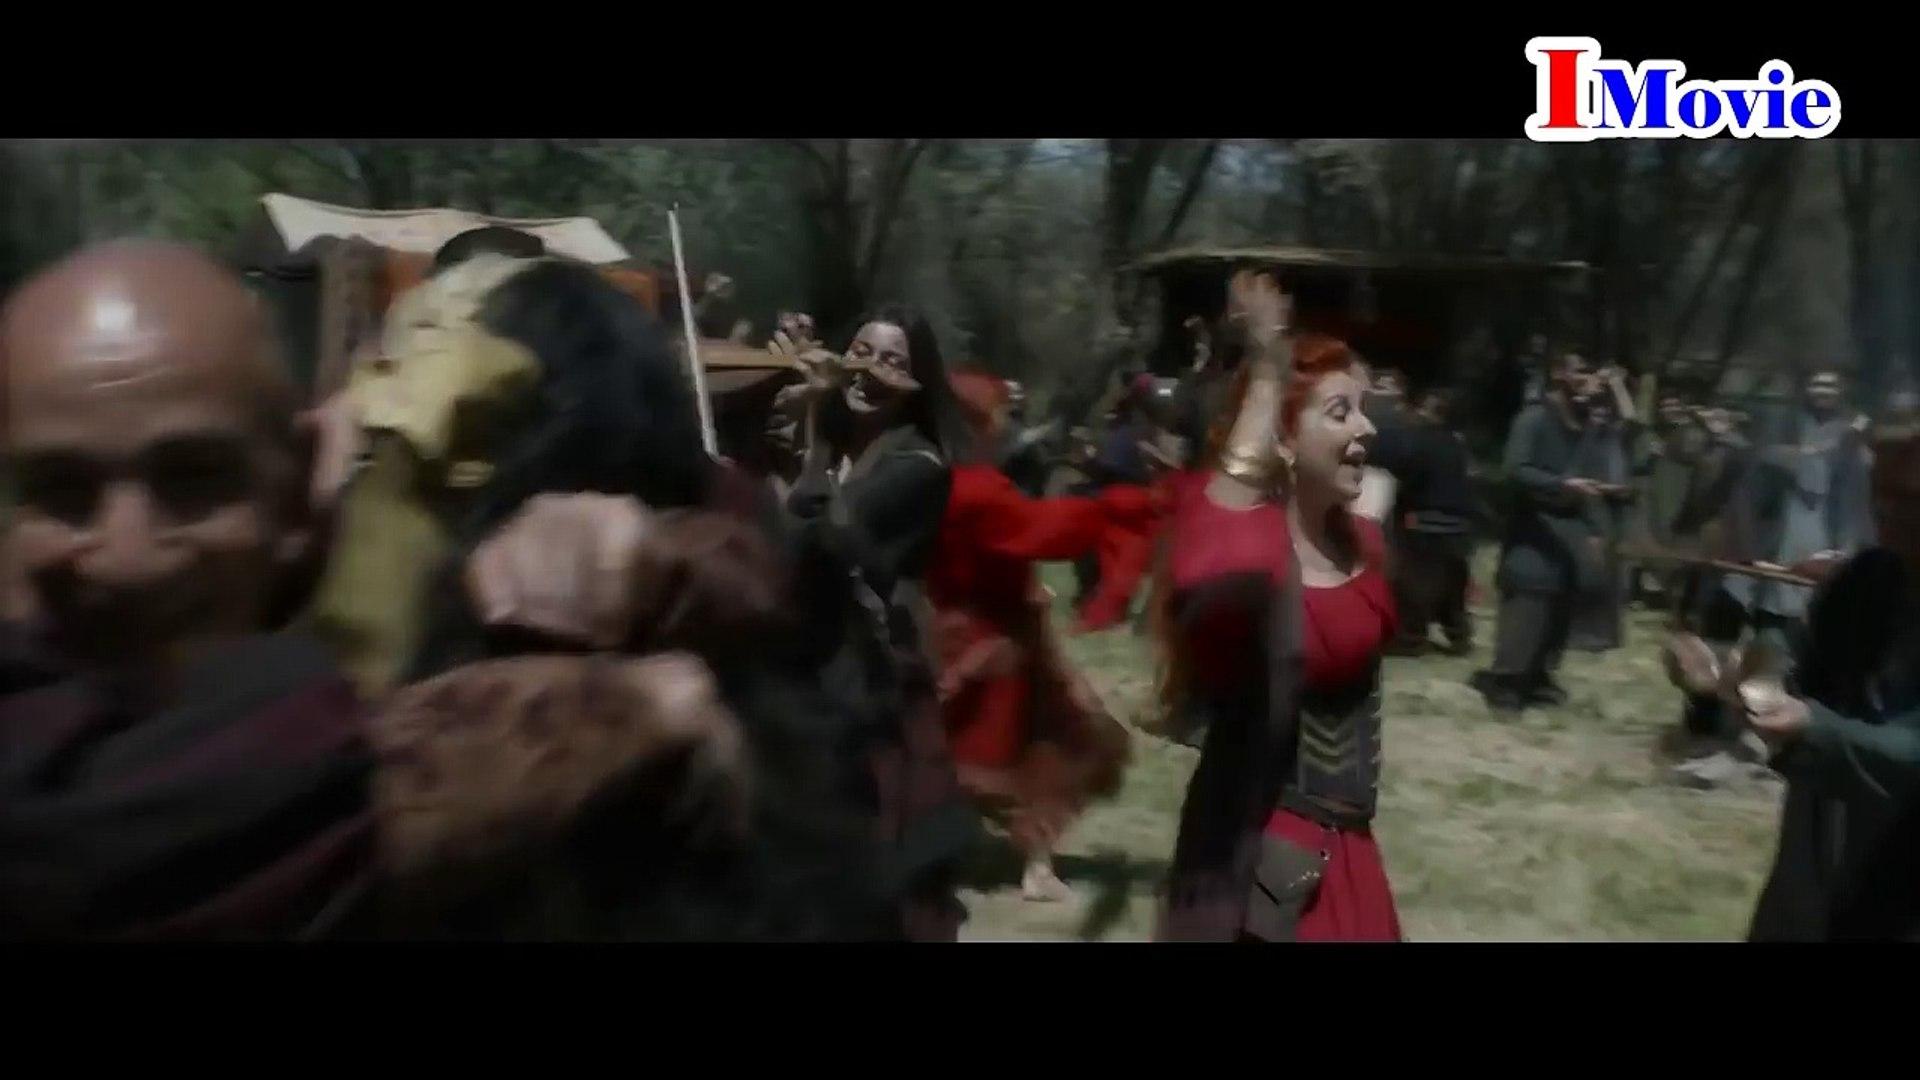 Deliler Trailer  (2019) Turkish Movie ❇ I Movie ❇ Islamic Movie ❇ Islamic Historical Movie